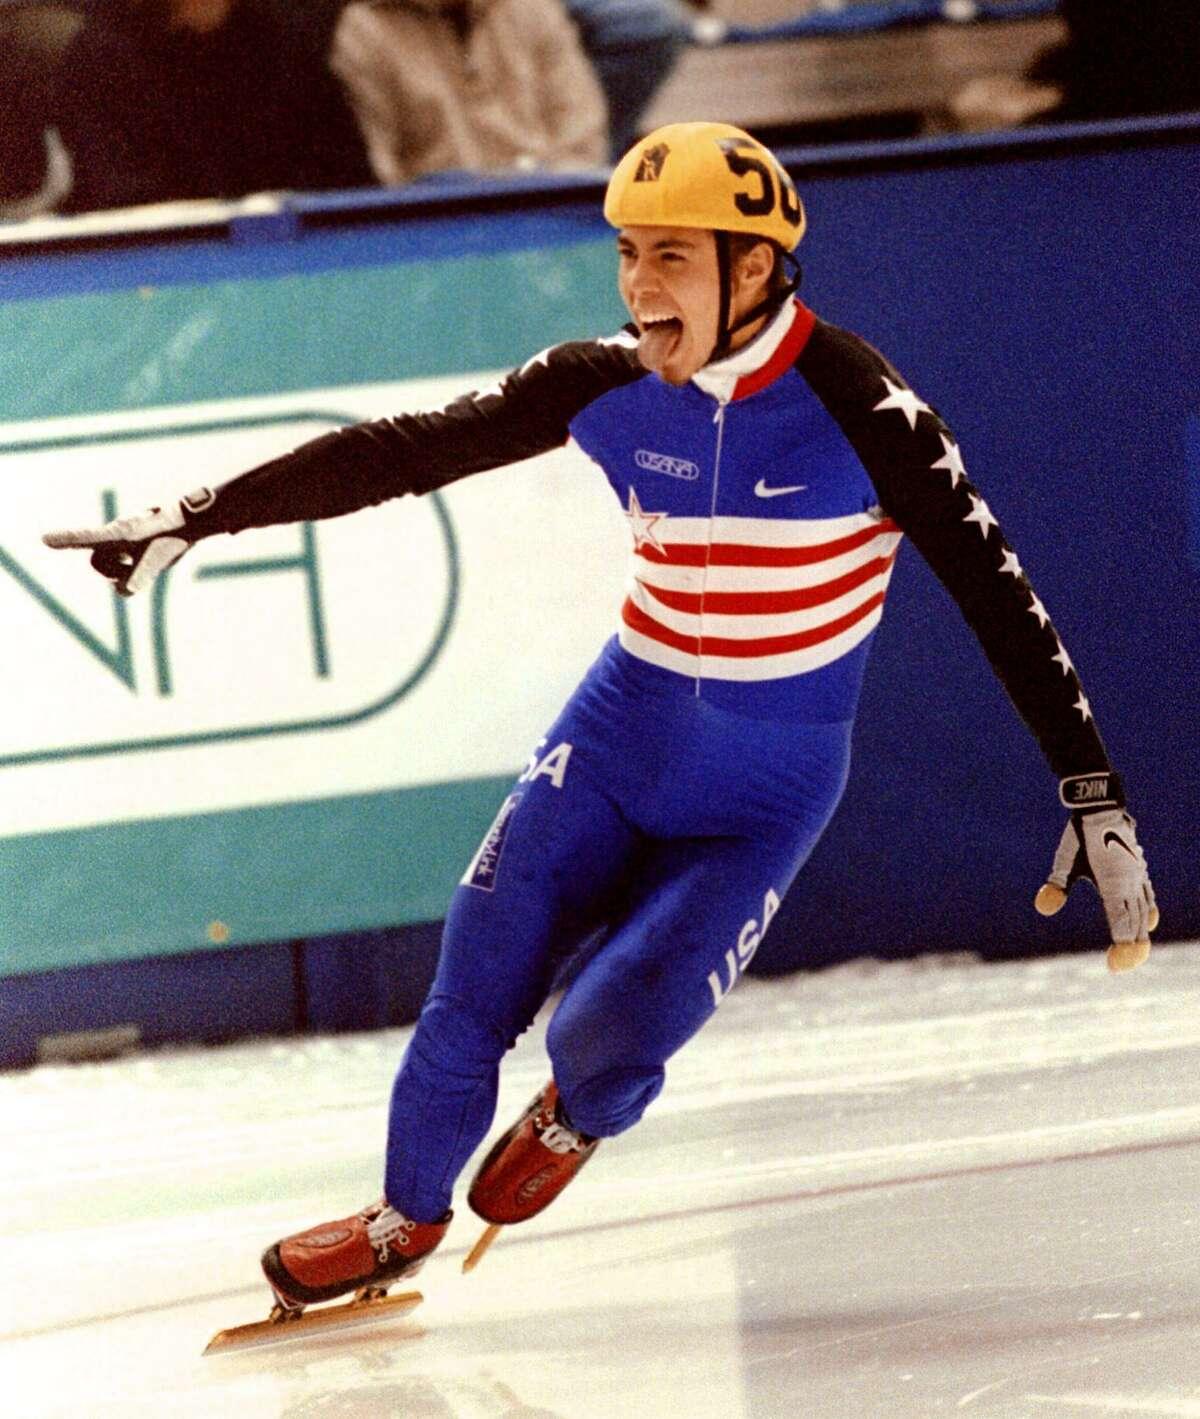 Apolo Anton Ohno of the US celebrates winning the men's 500-meter World Cup short track speedskating event Oct. 21, 2000 in Calgary, Alberta.